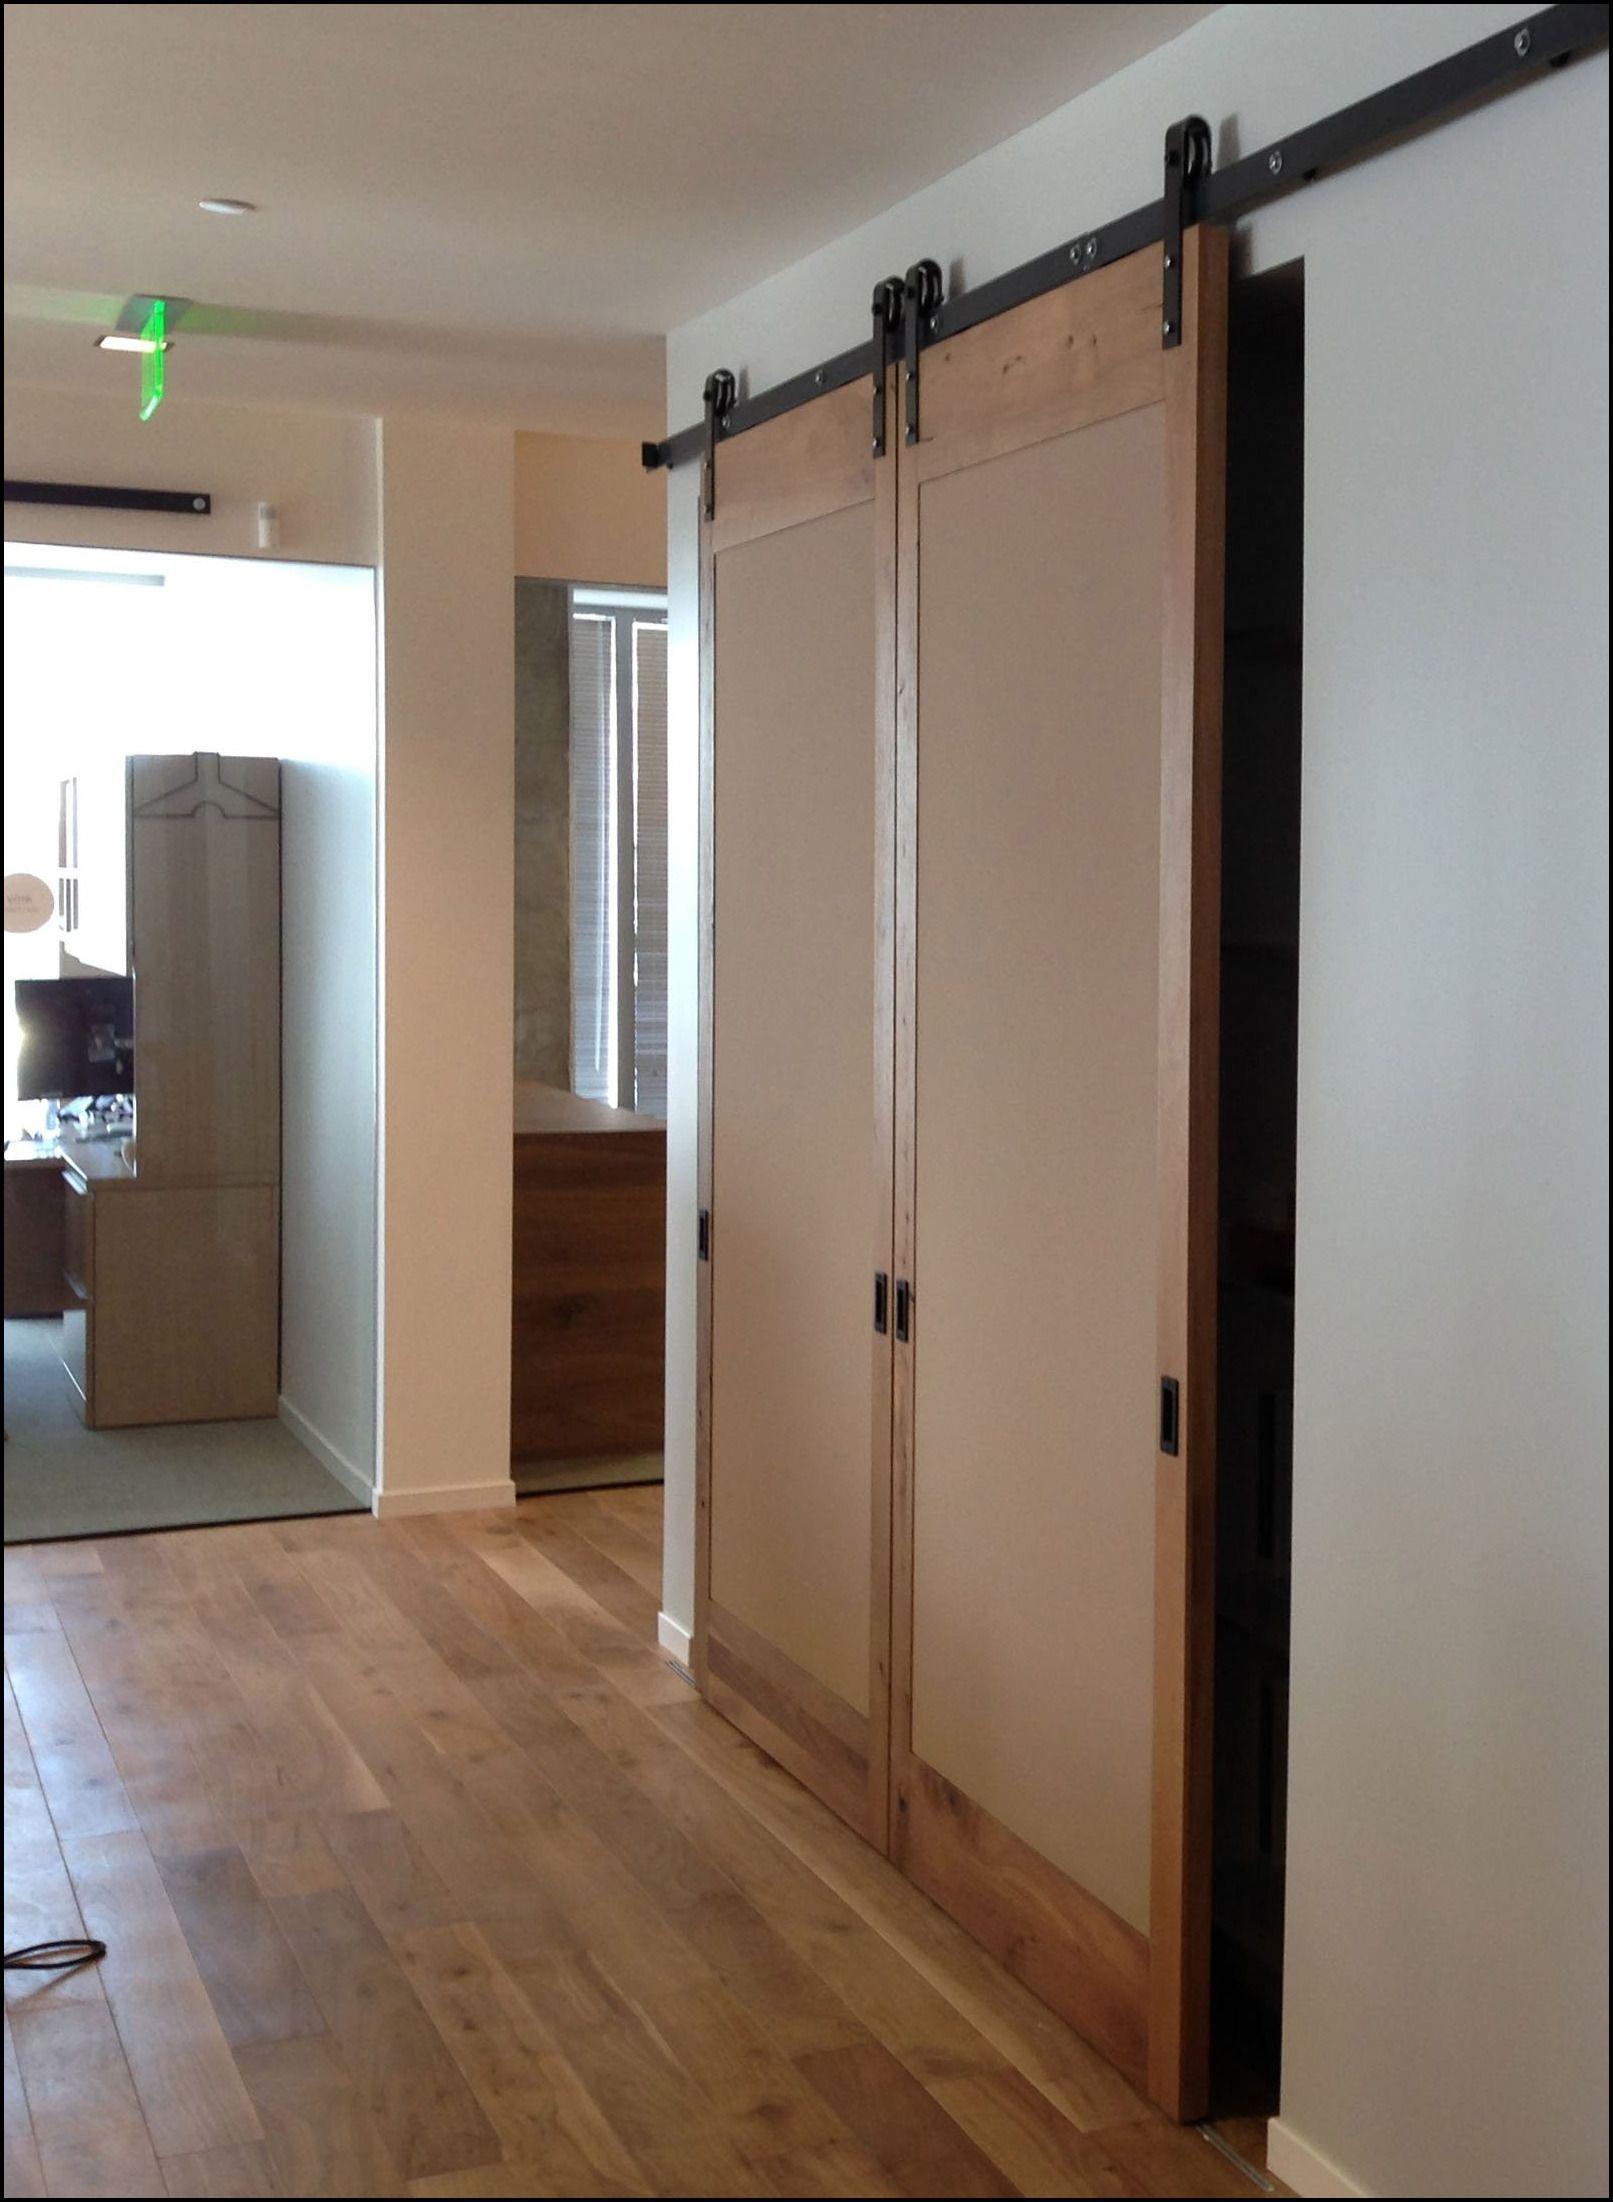 Temporary Walls Room Dividers And Tempor Fabric Diy Divider